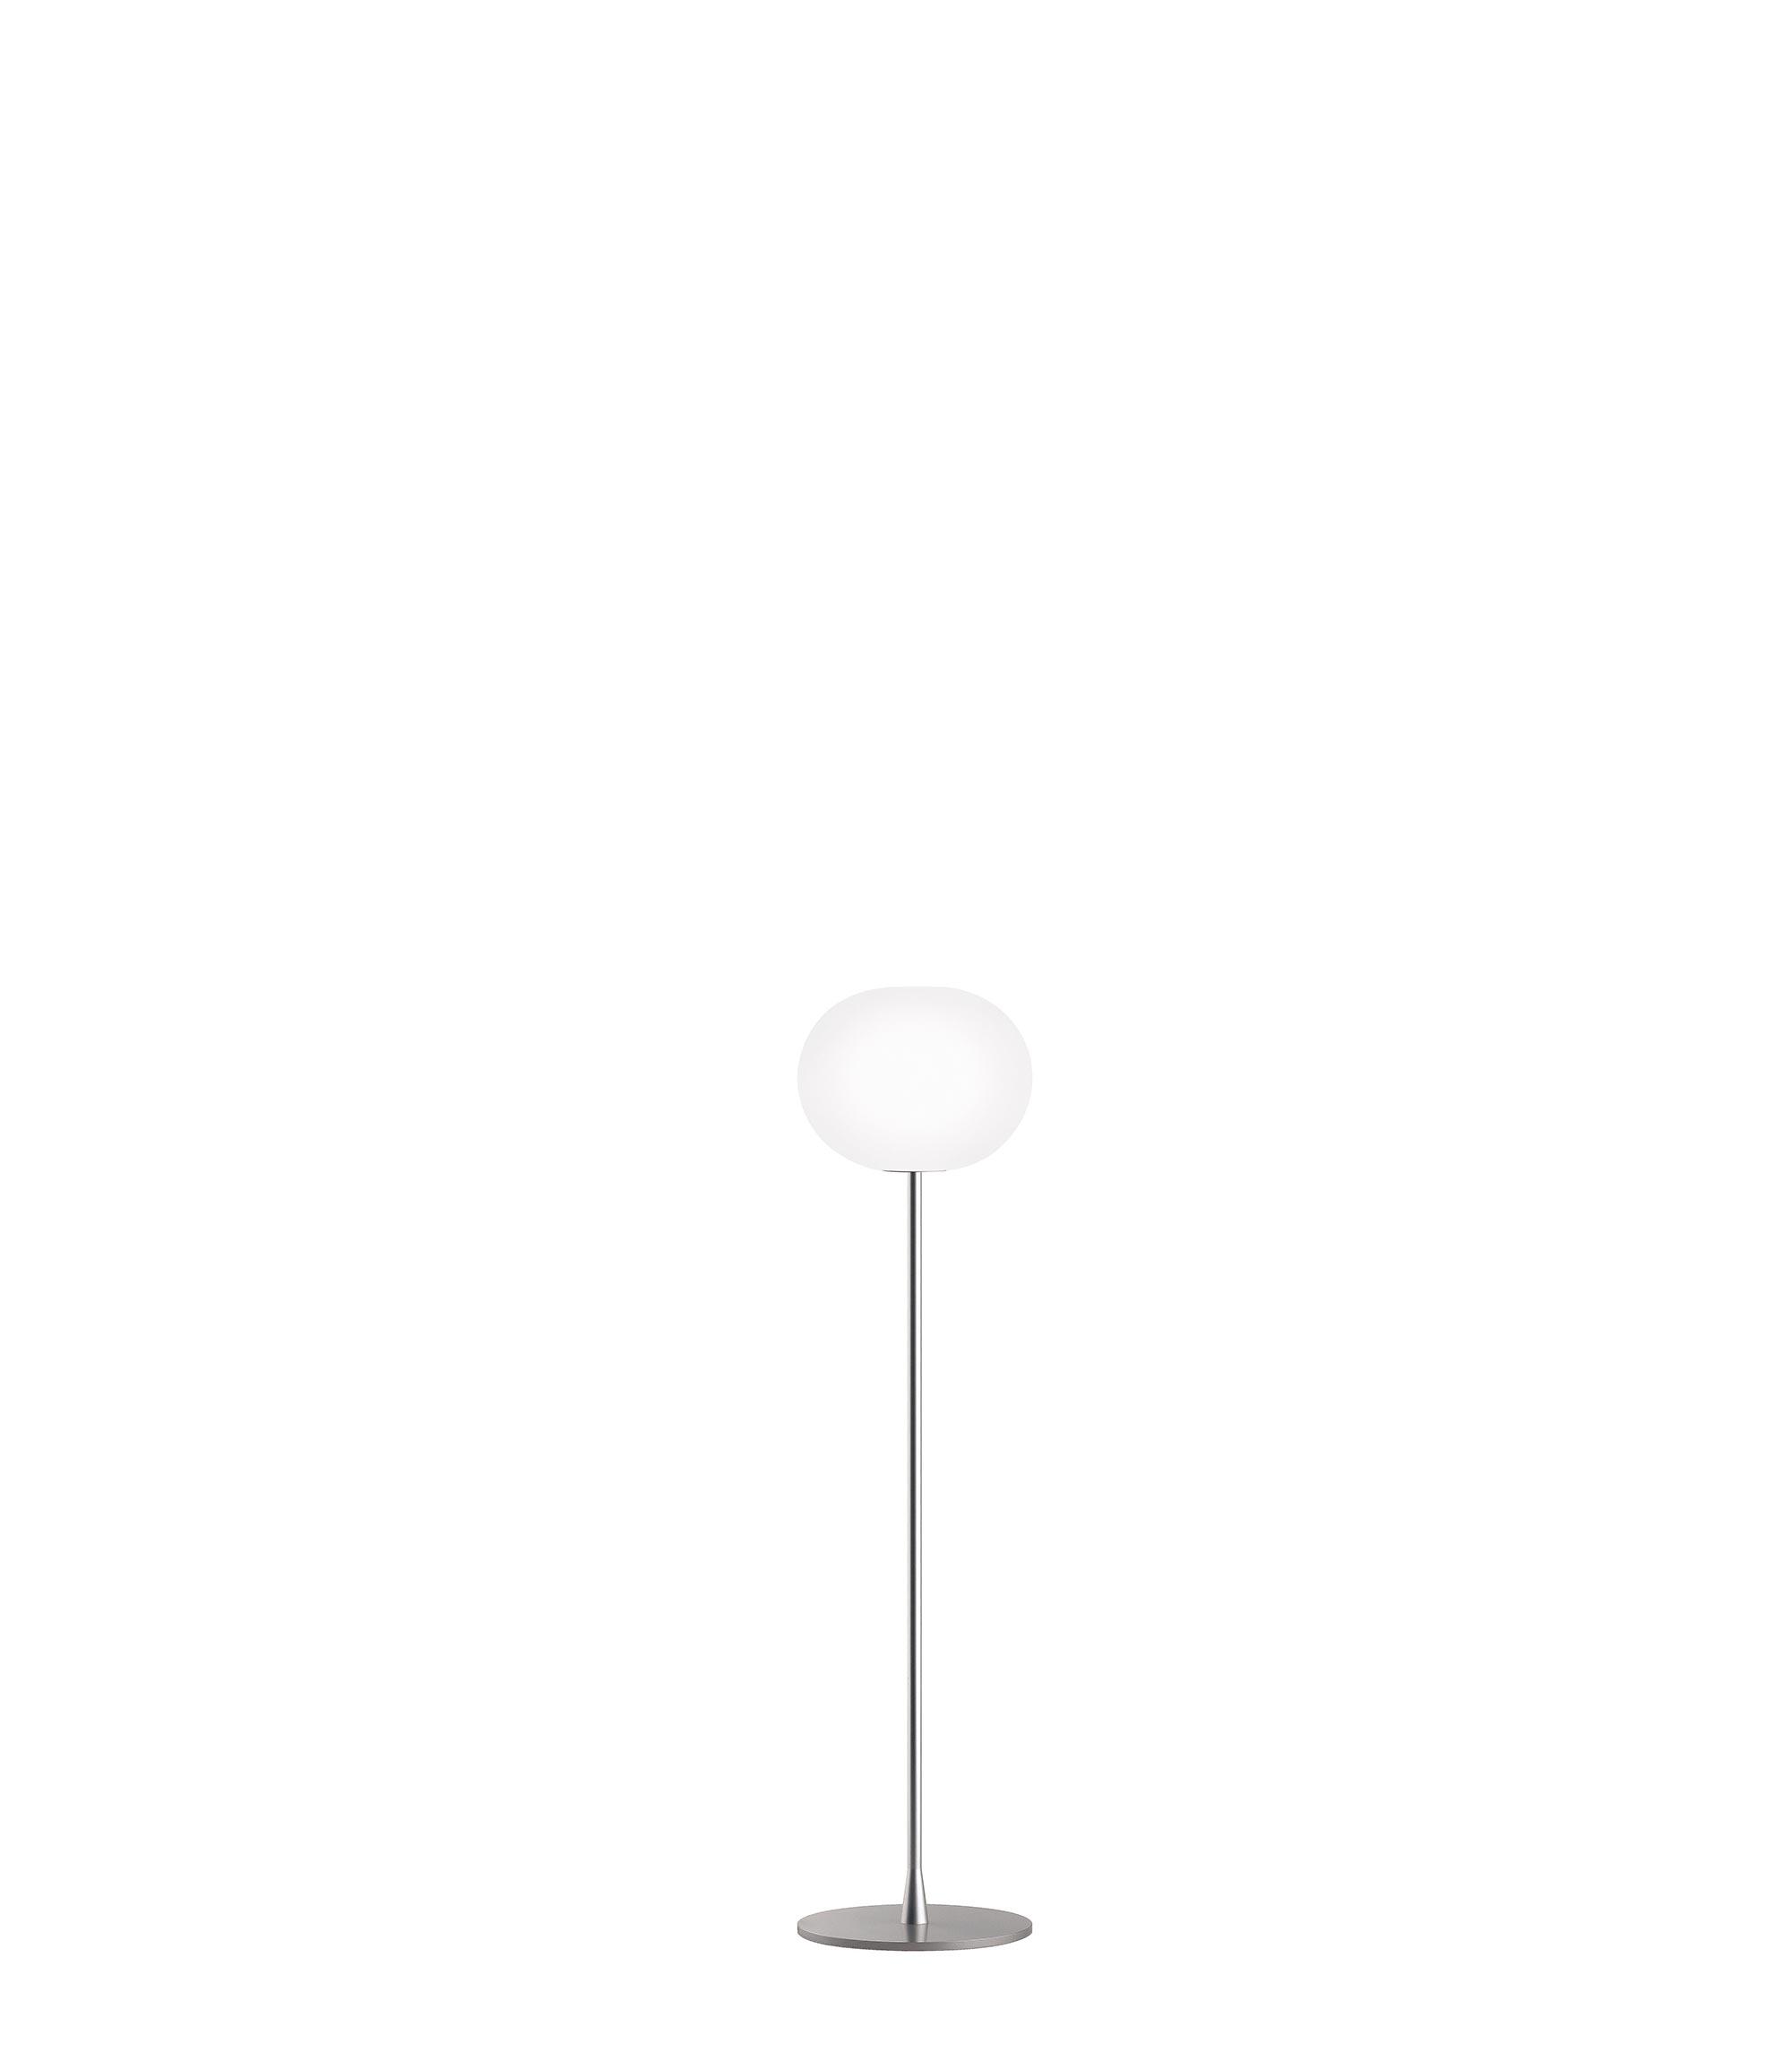 Glo ball floor 1 morrison flos F3031020 product still life big 2